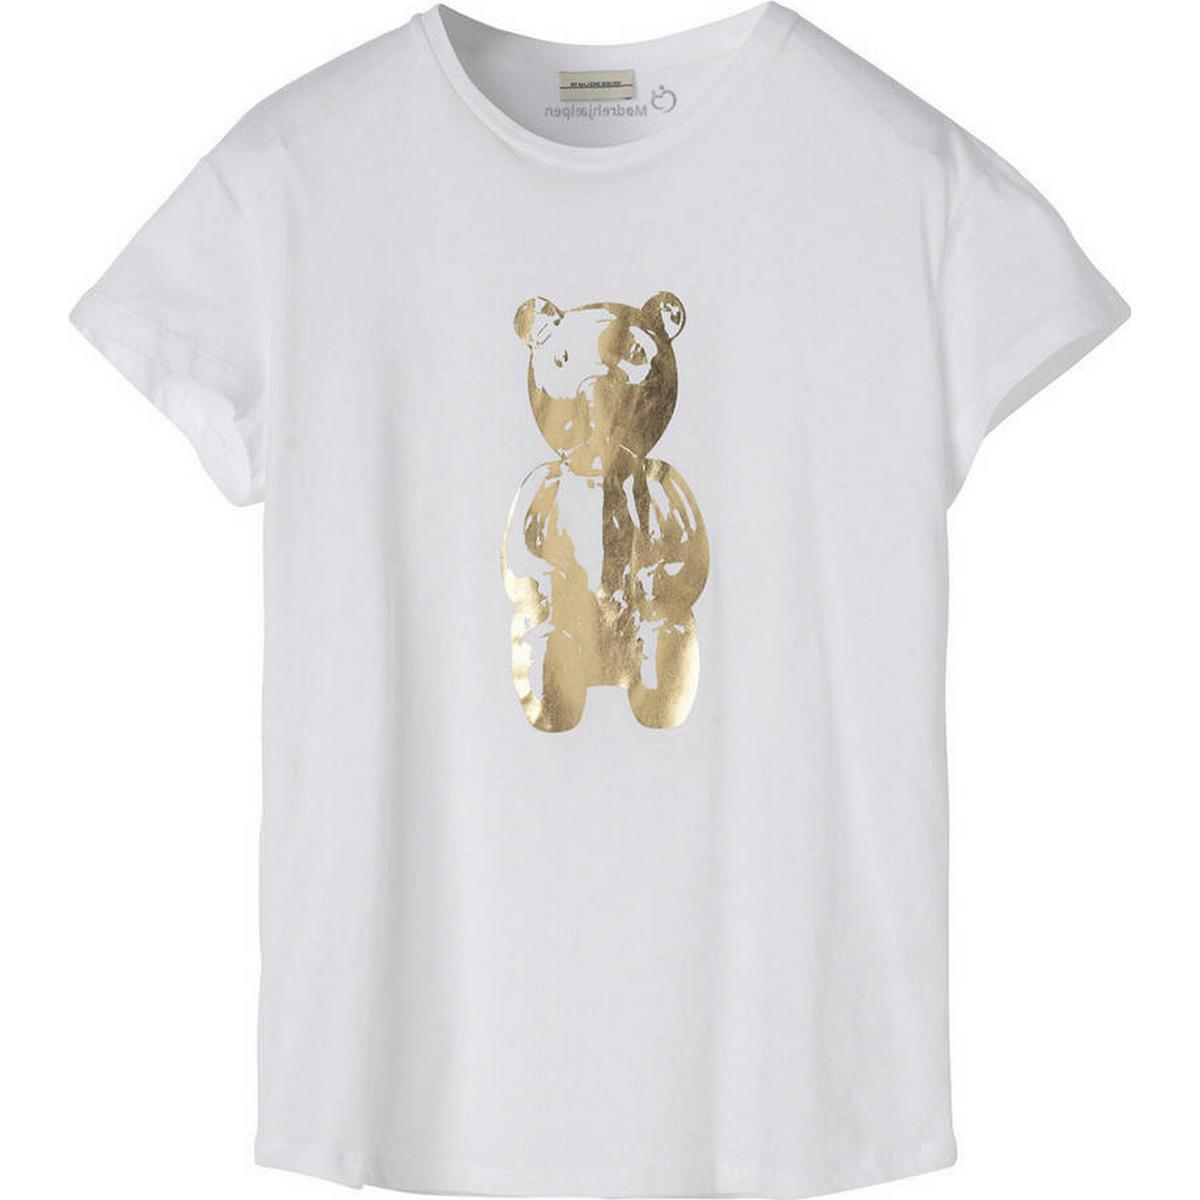 b5aa432f9 By Malene Birger T-shirt Dametøj - Sammenlign priser hos PriceRunner